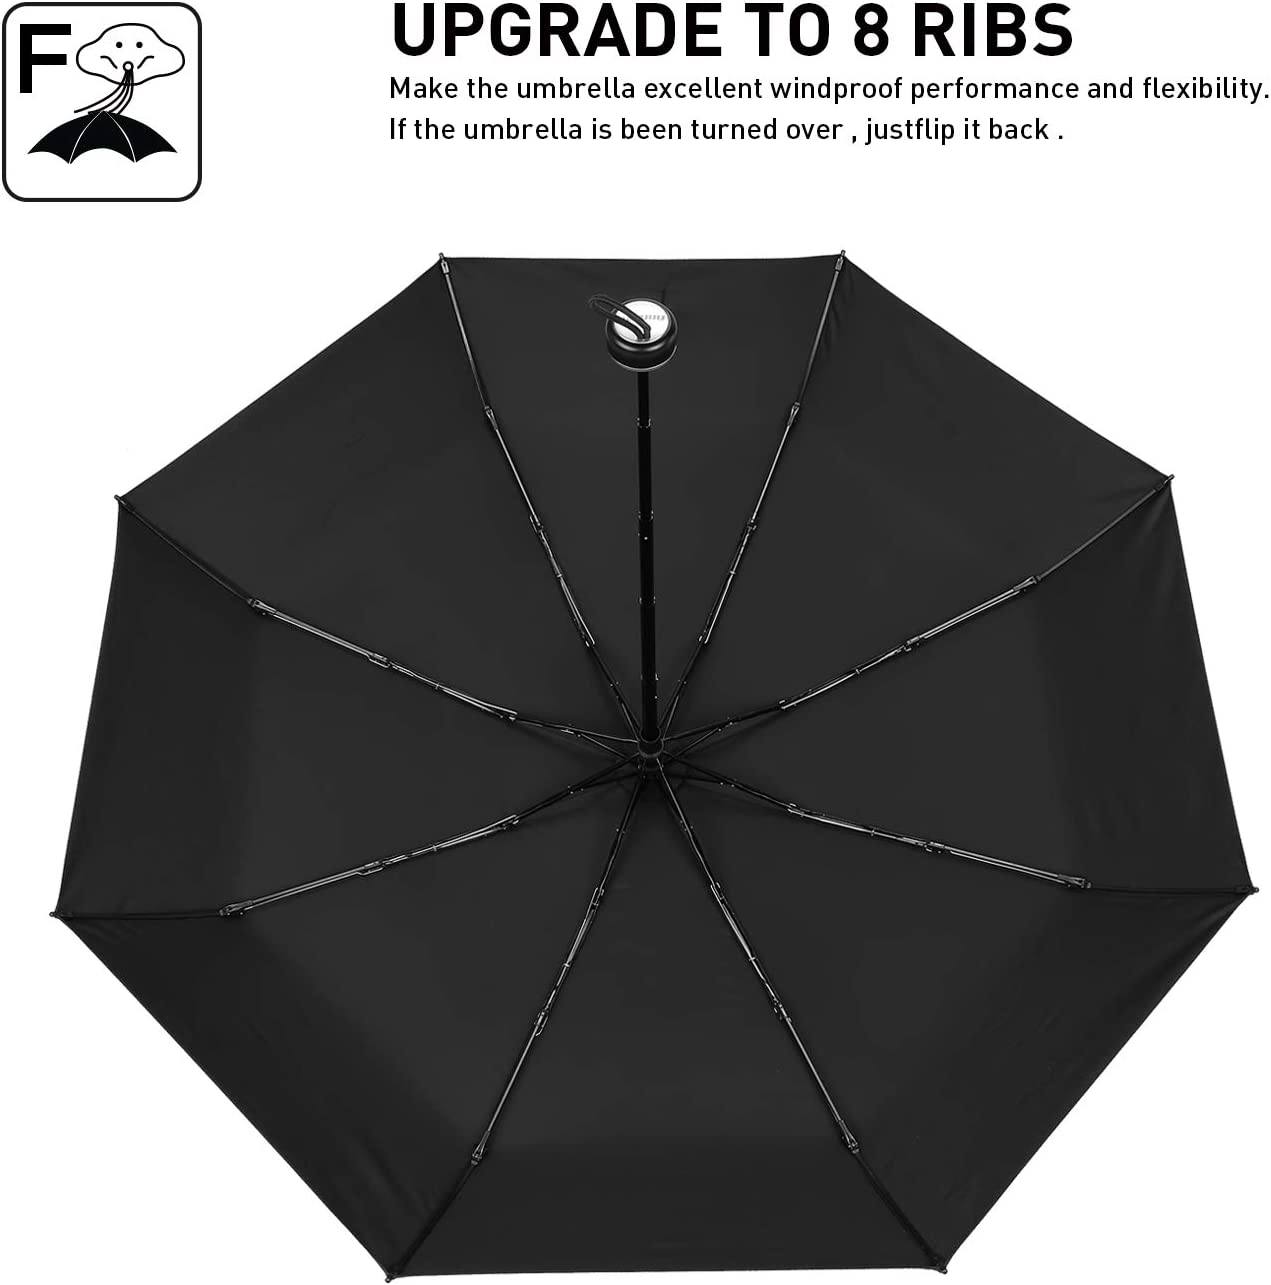 Compact Folding Reverse Umbrella for Outdoor/&Travel Brainstorming Windproof Travel Umbrella Inverted Automatic Open Close Umbrella with 8 Fiberglass Ribs,Teflon Coating Sun /& Rain